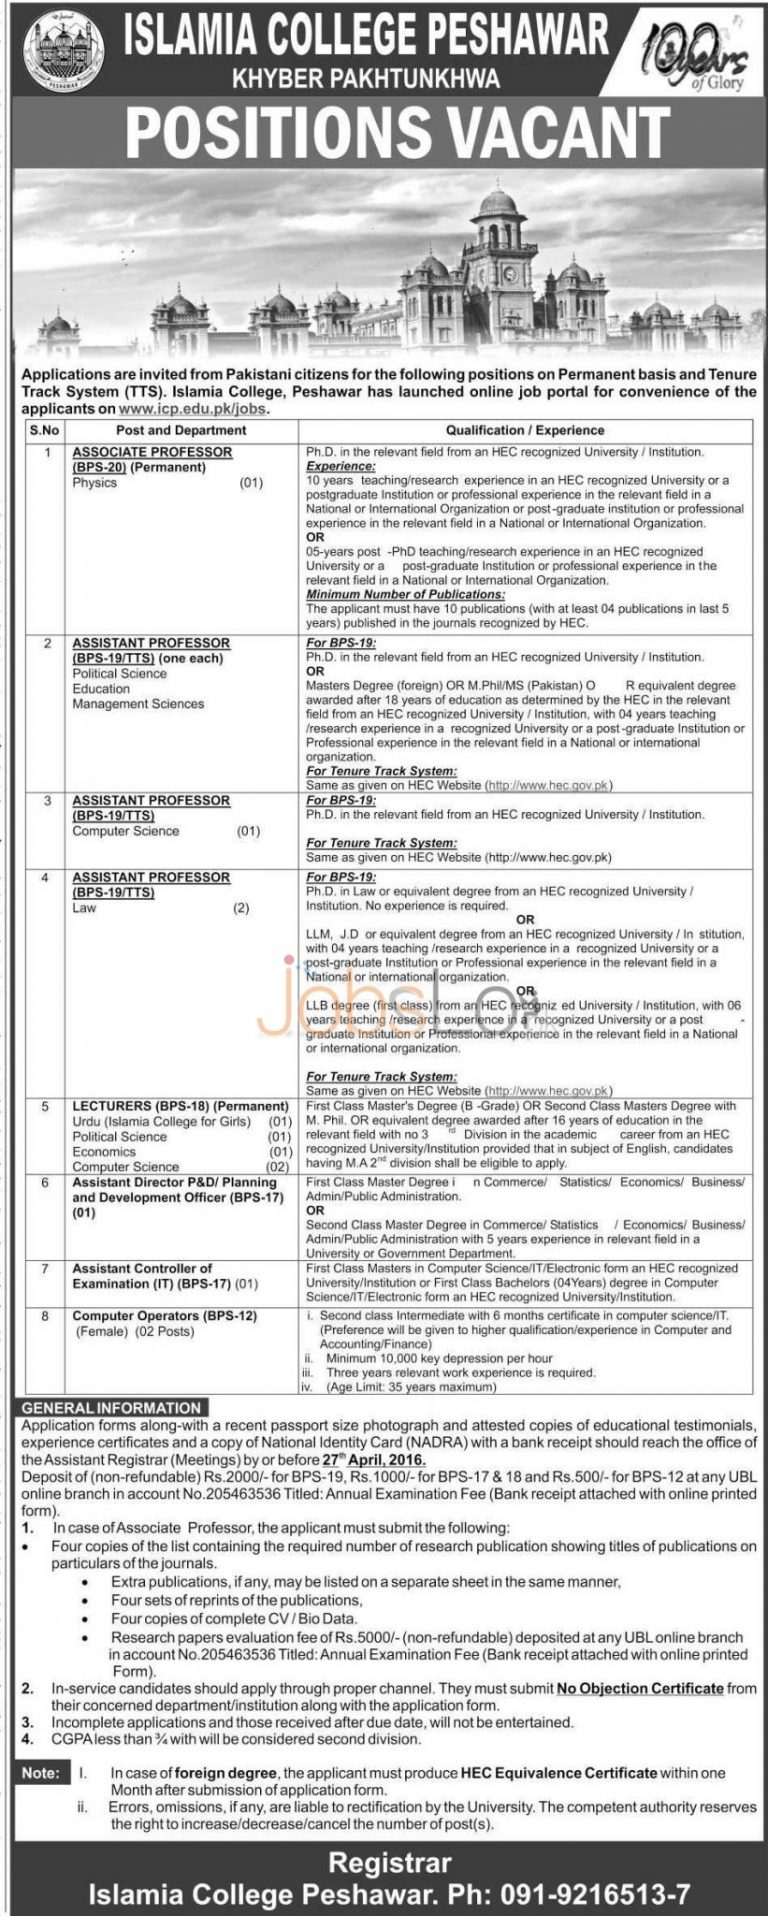 Islamia College Peshawar Jobs April 2016 For Teaching & Non Teaching Staff Application Form